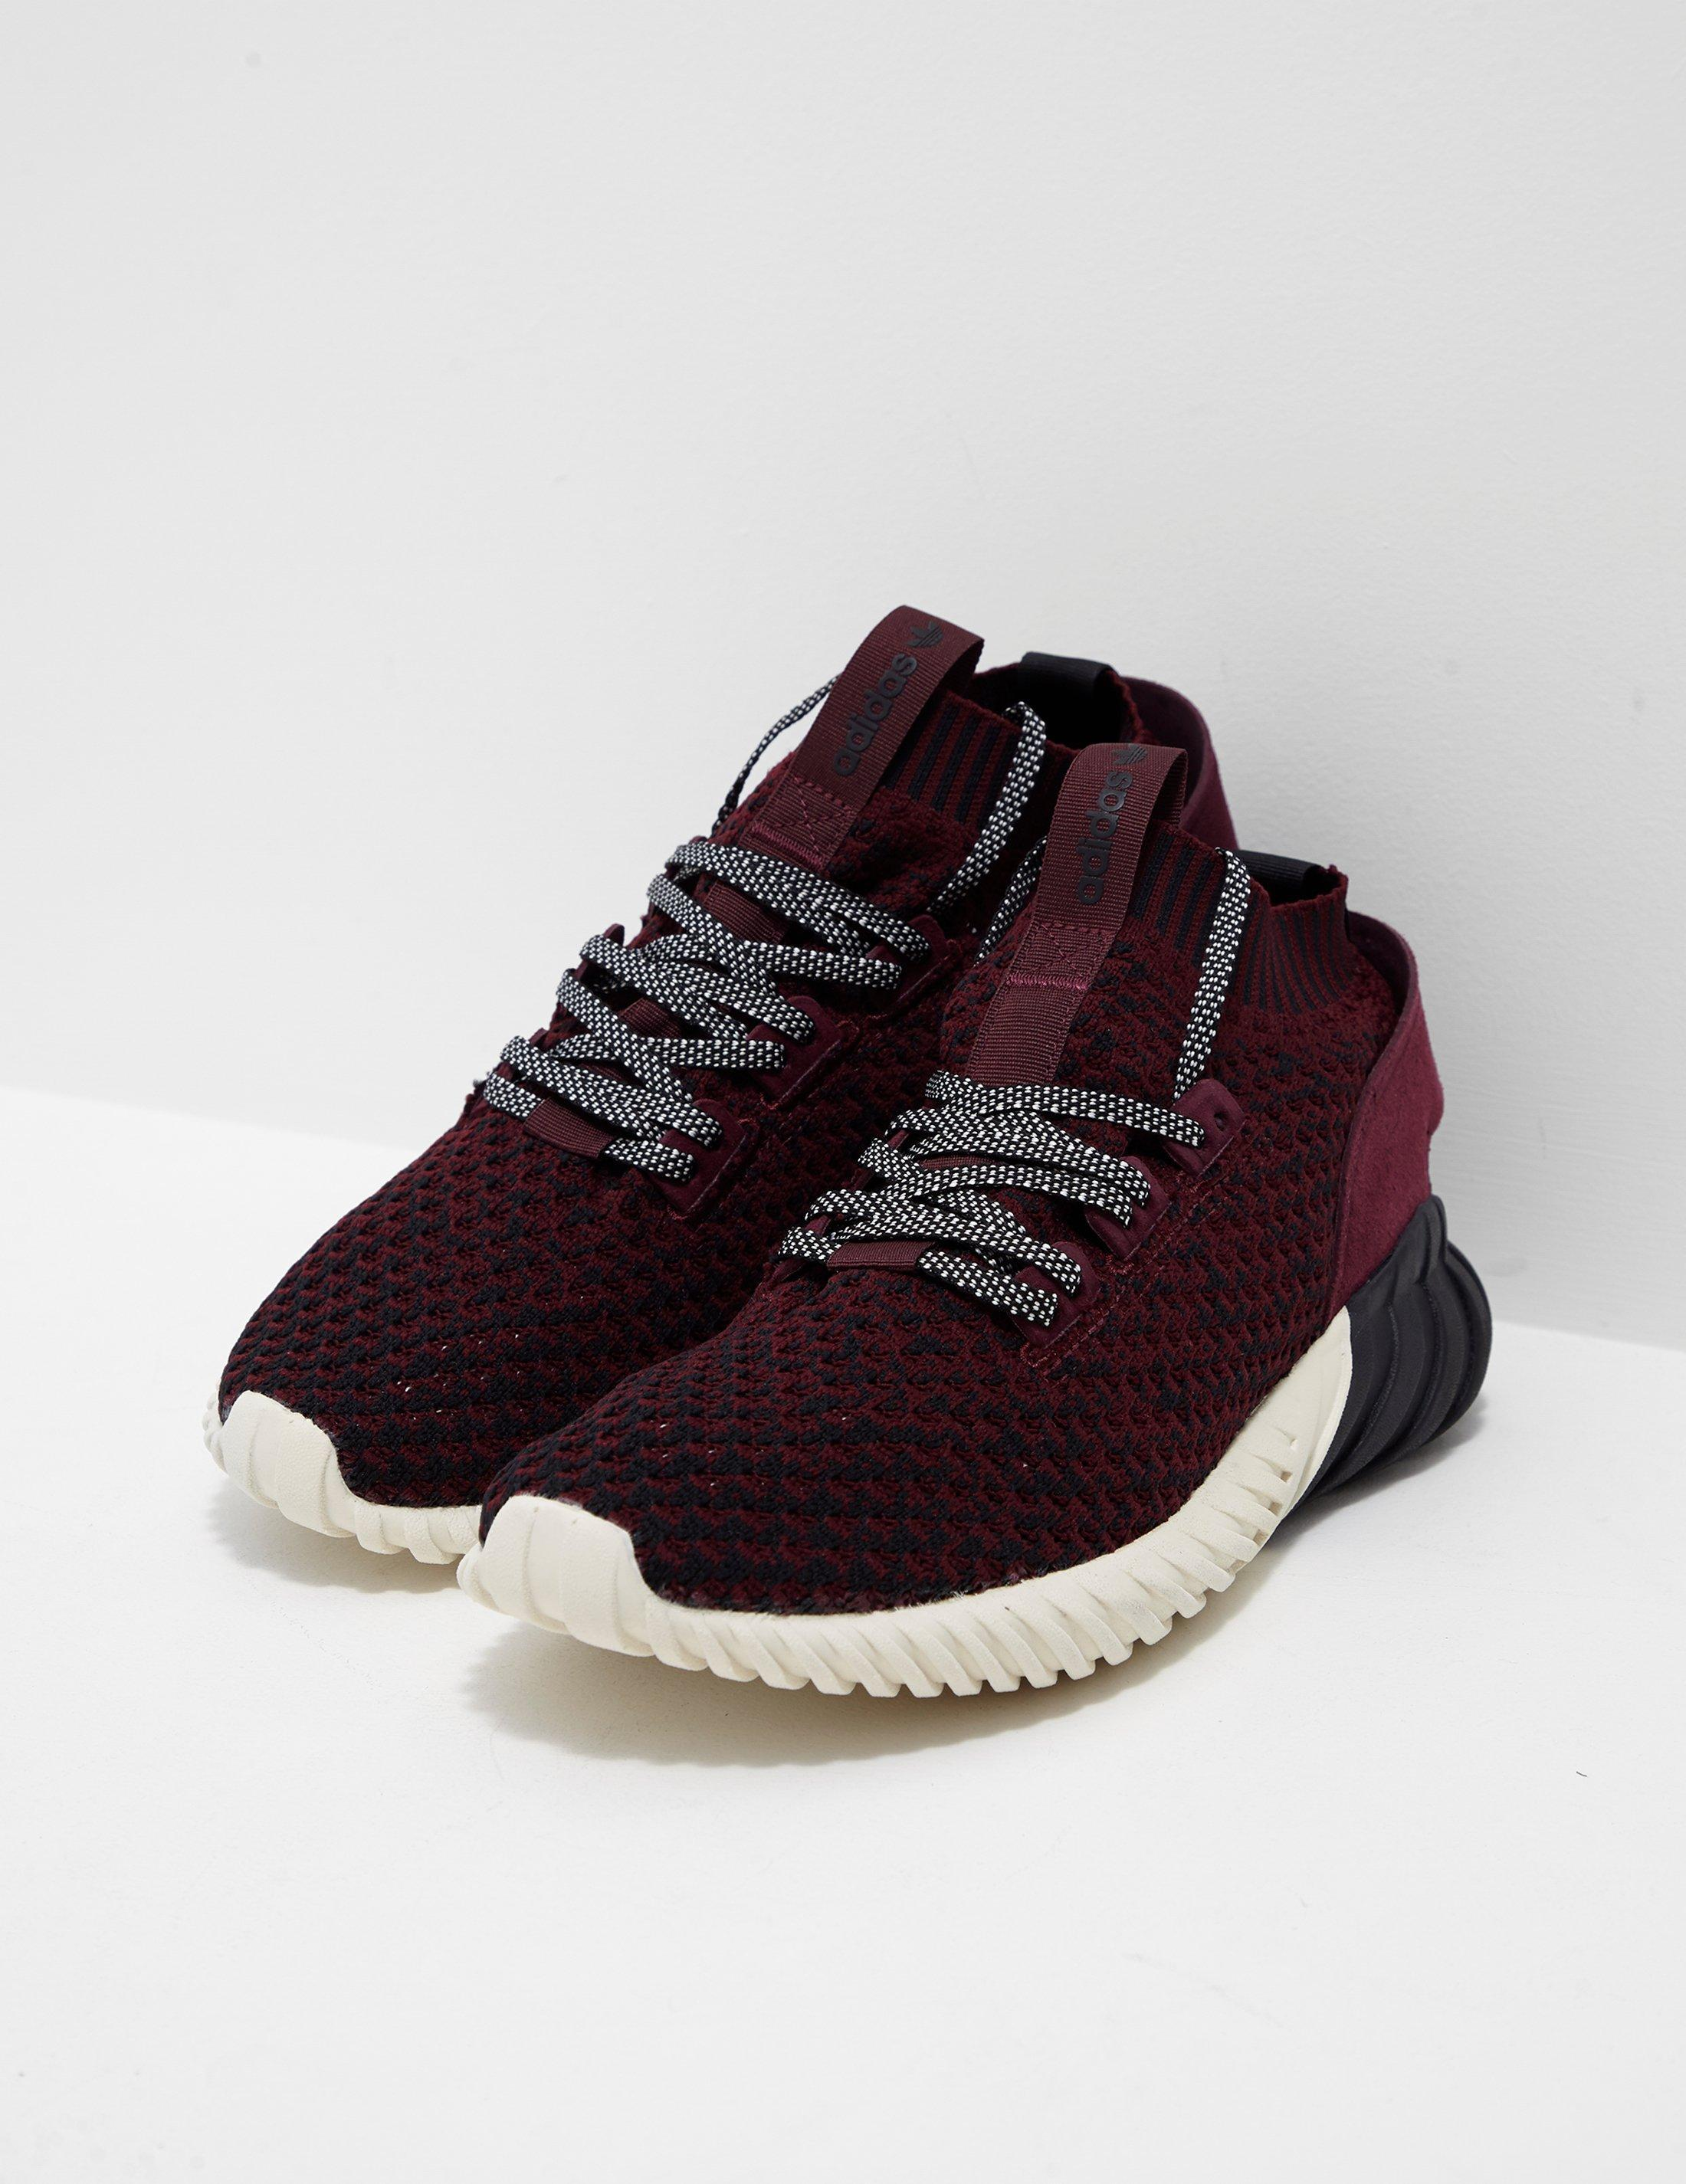 adidas originali mens tubulare tubulare mens doom sock primeknit bordeaux / nero 06dc7f